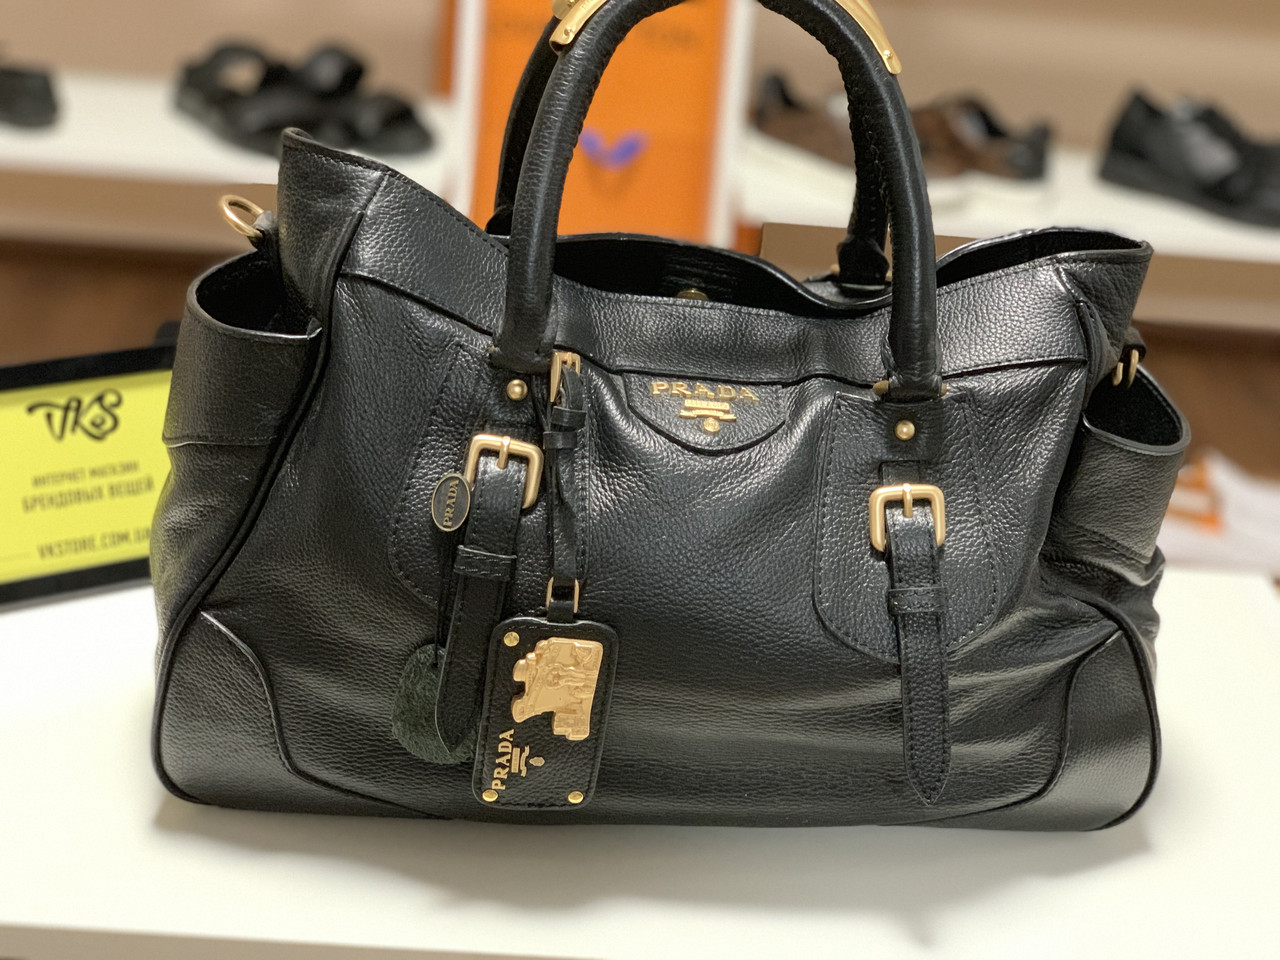 Prada женская сумка реплика 7А класса (Прада) арт. 01-03